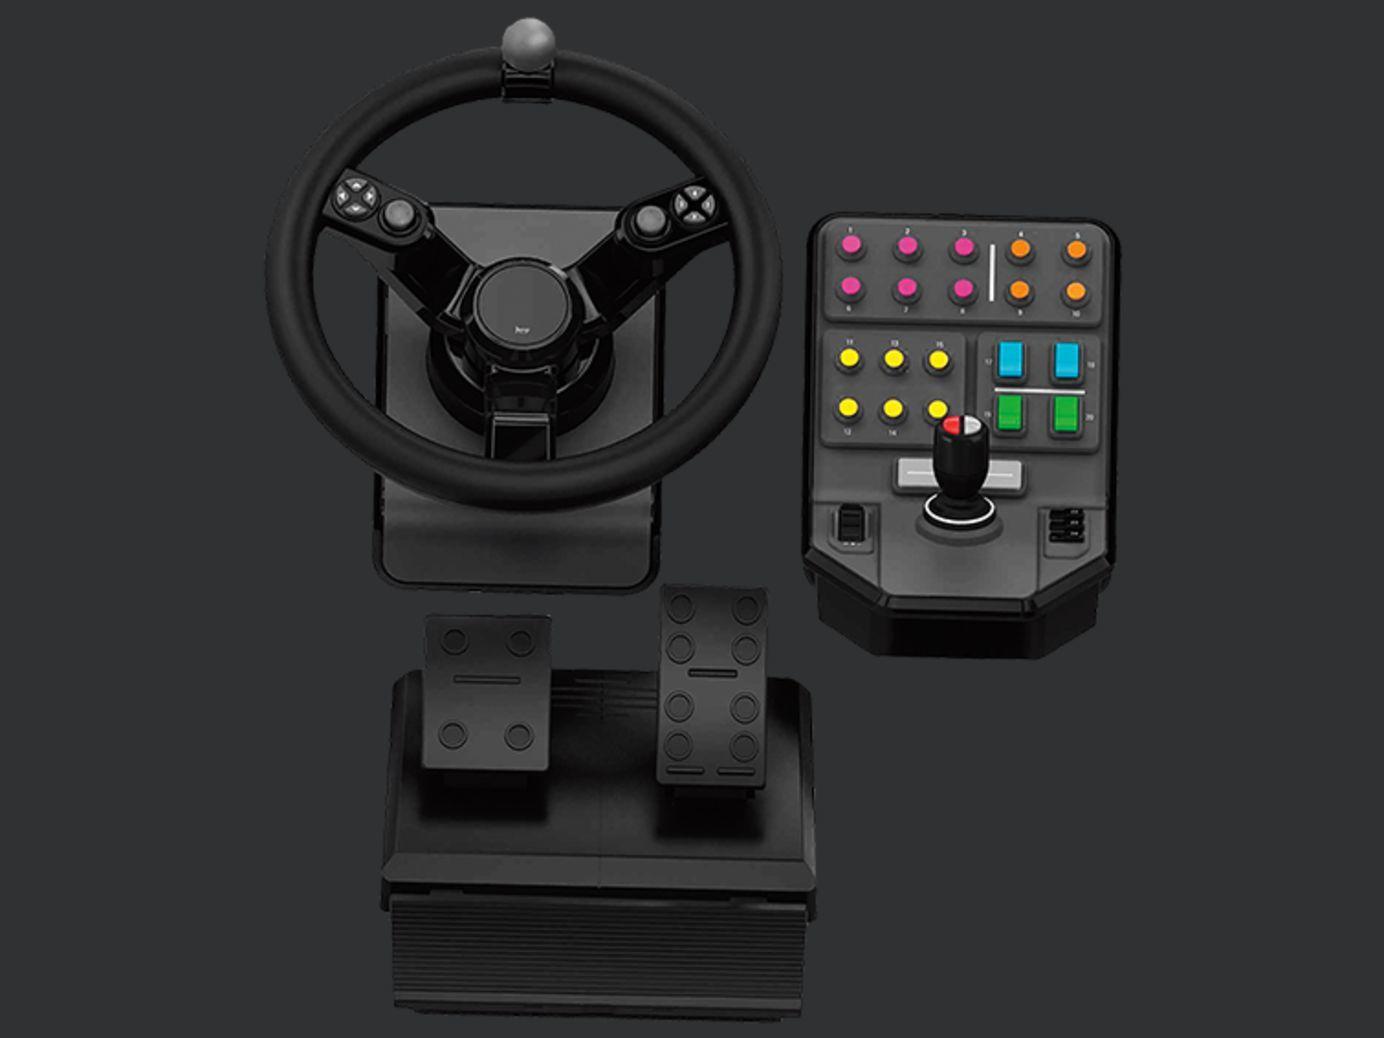 Farm Sim Controller